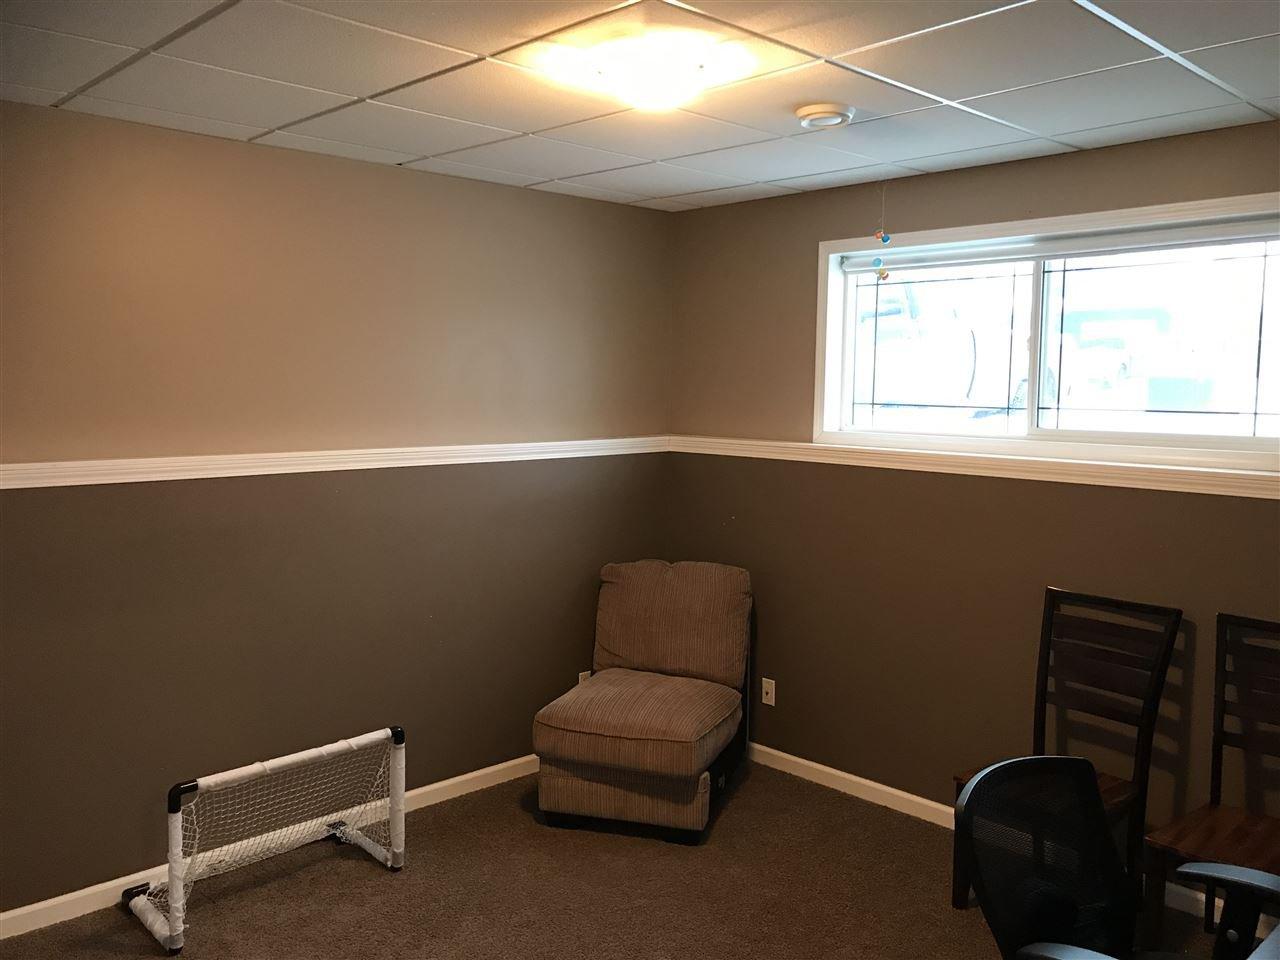 "Photo 13: Photos: 8724 114 Avenue in Fort St. John: Fort St. John - City NE House for sale in ""PANORAMA RIDGE"" (Fort St. John (Zone 60))  : MLS®# R2428633"